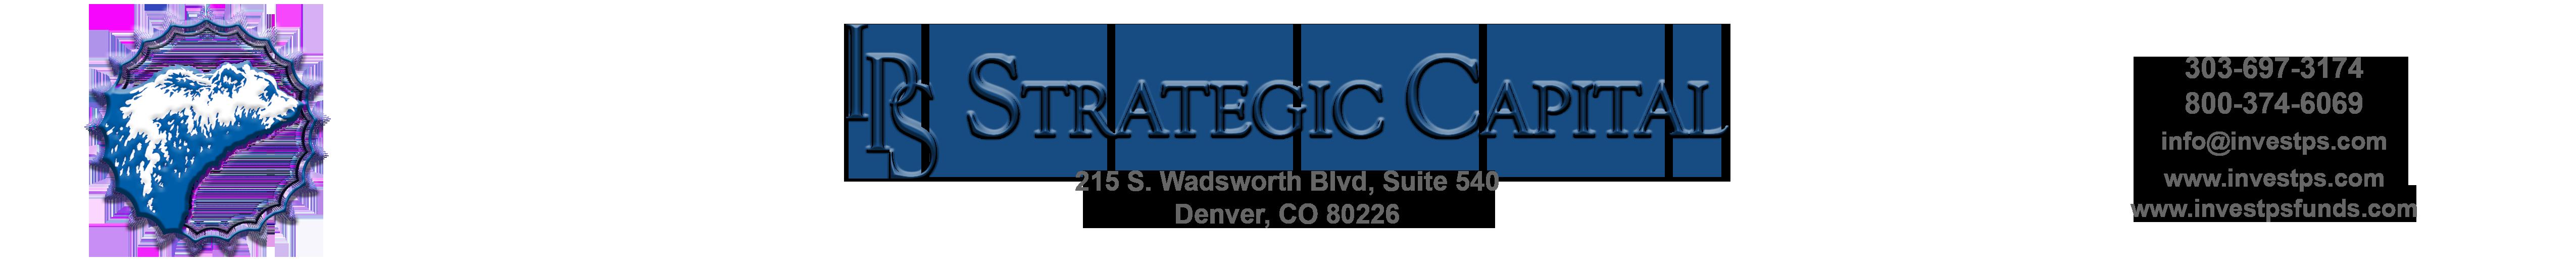 Financial Risk Management in Denver | IPS Strategic Capital